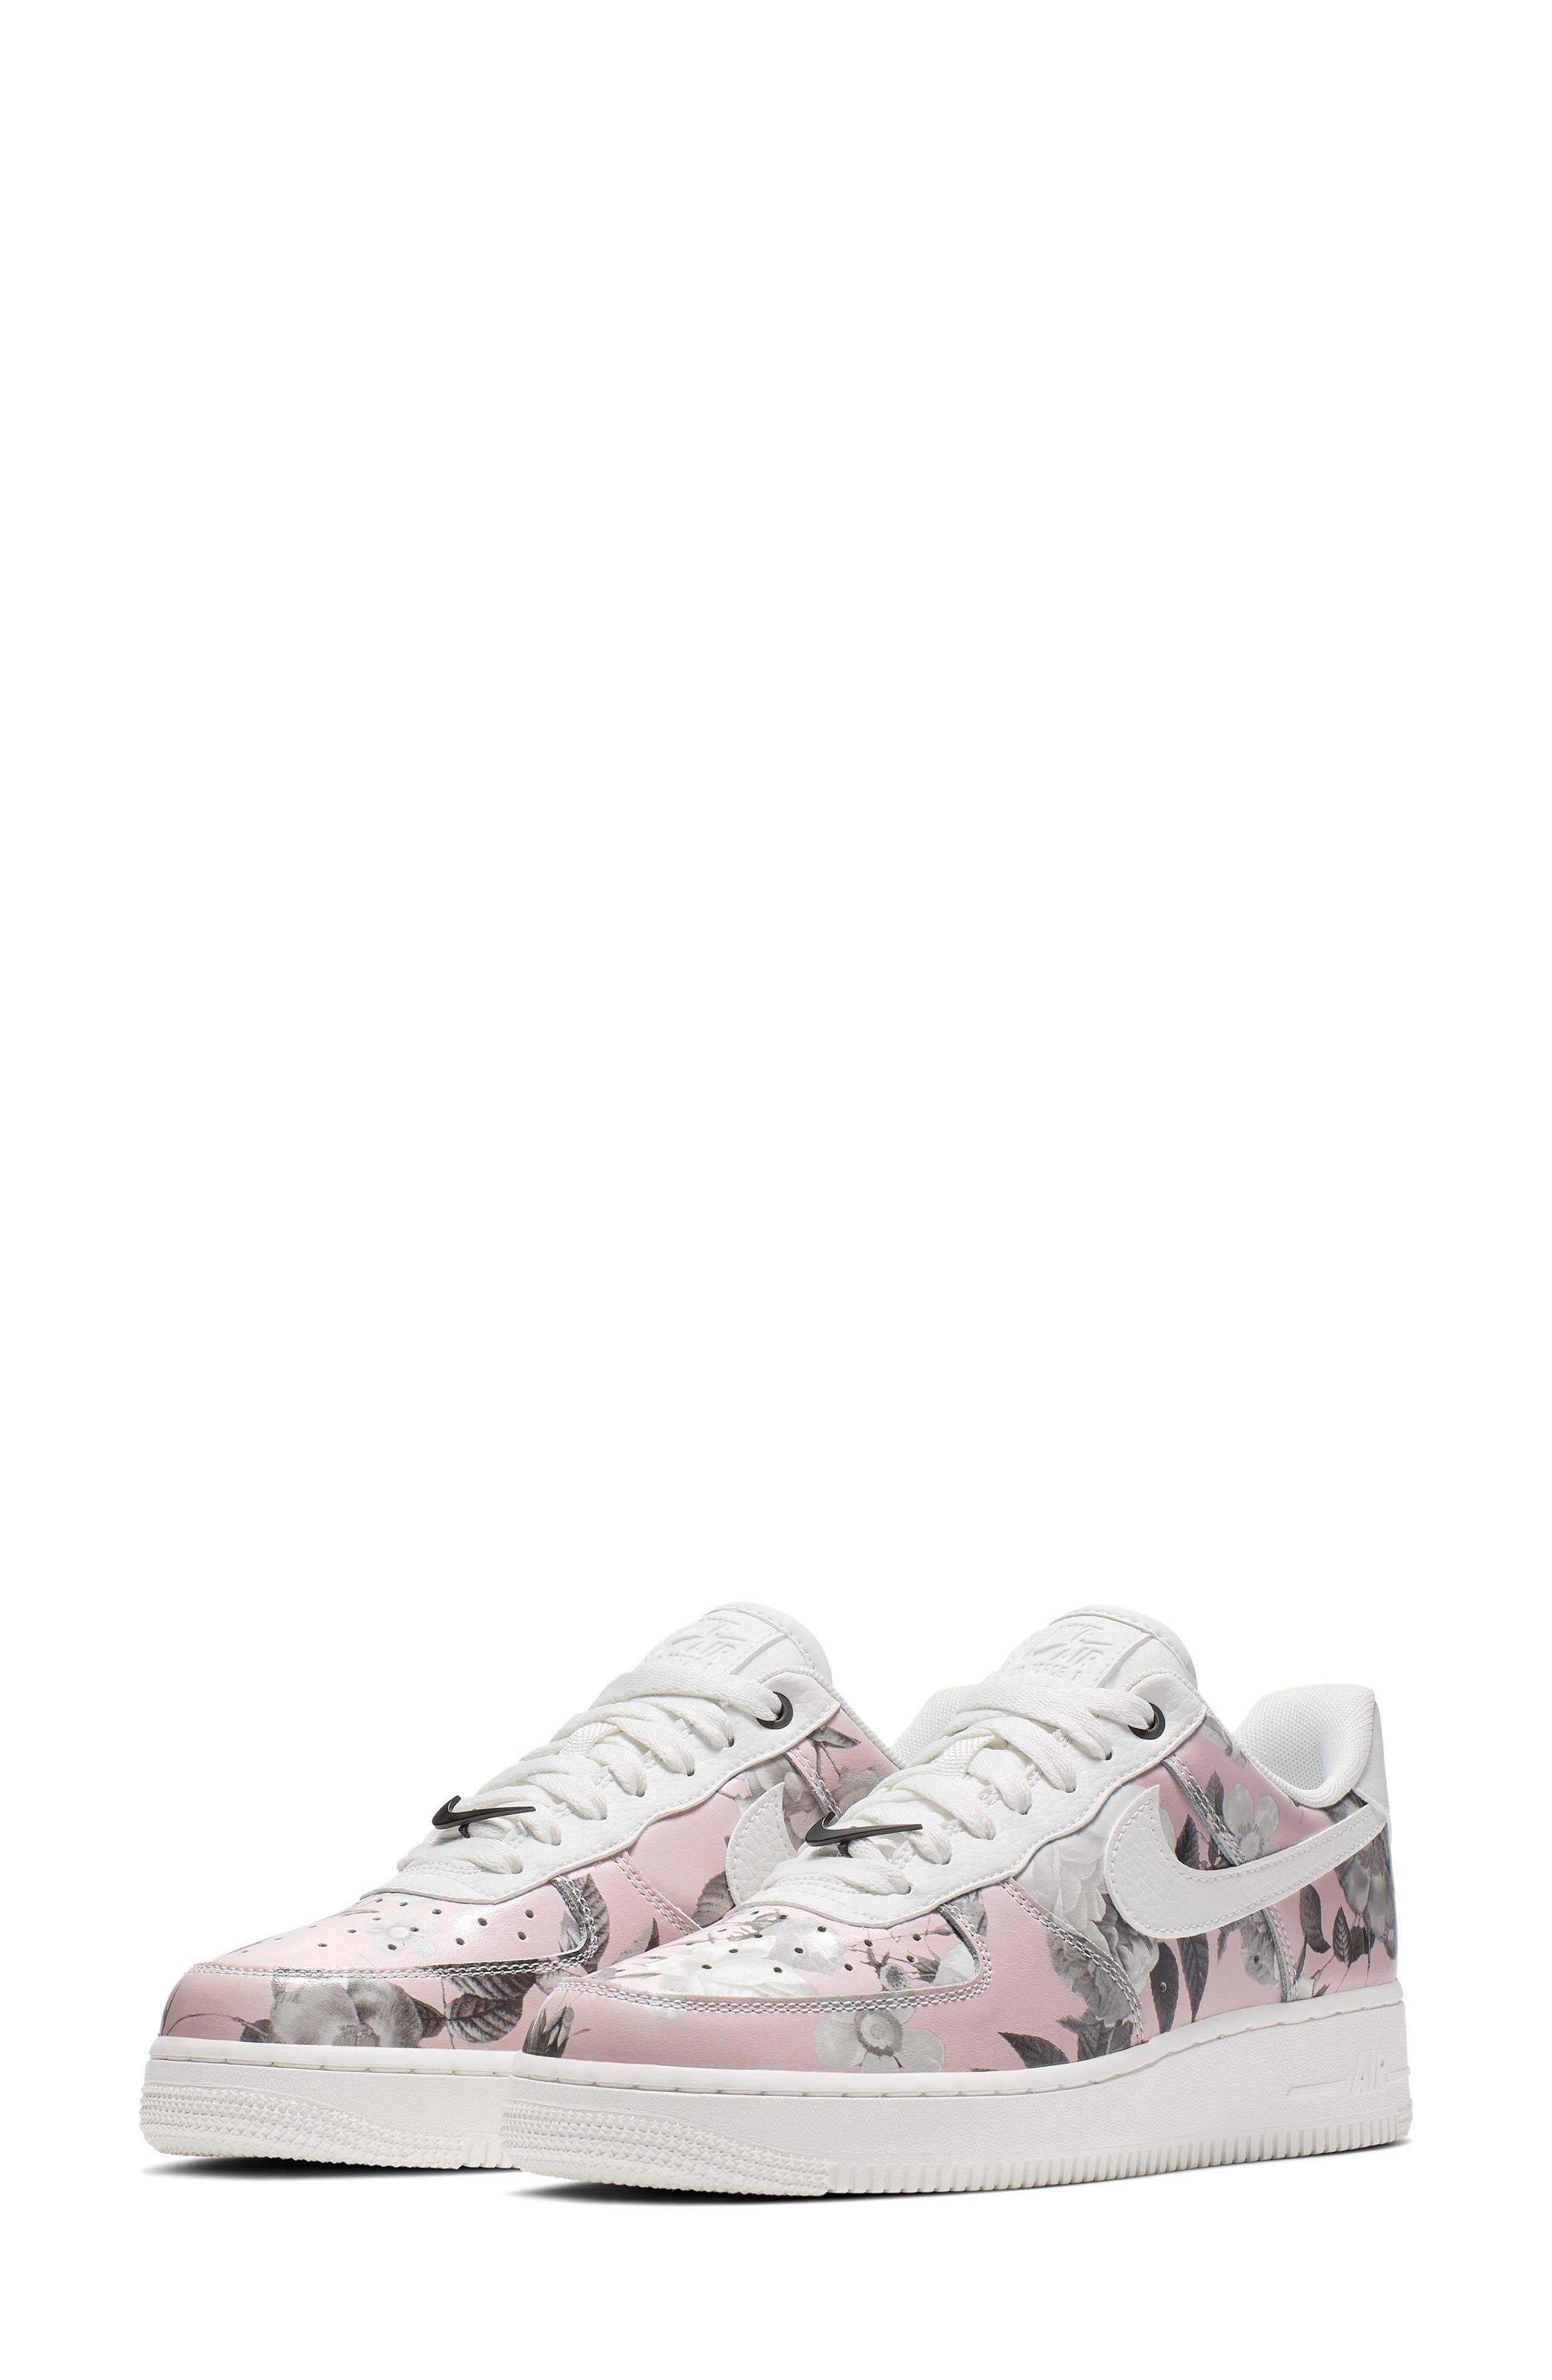 NIKE Air Force 1 '07 LXX Sneaker, Main, color, WHITE/ WHITE/ WHITE/ BLACK